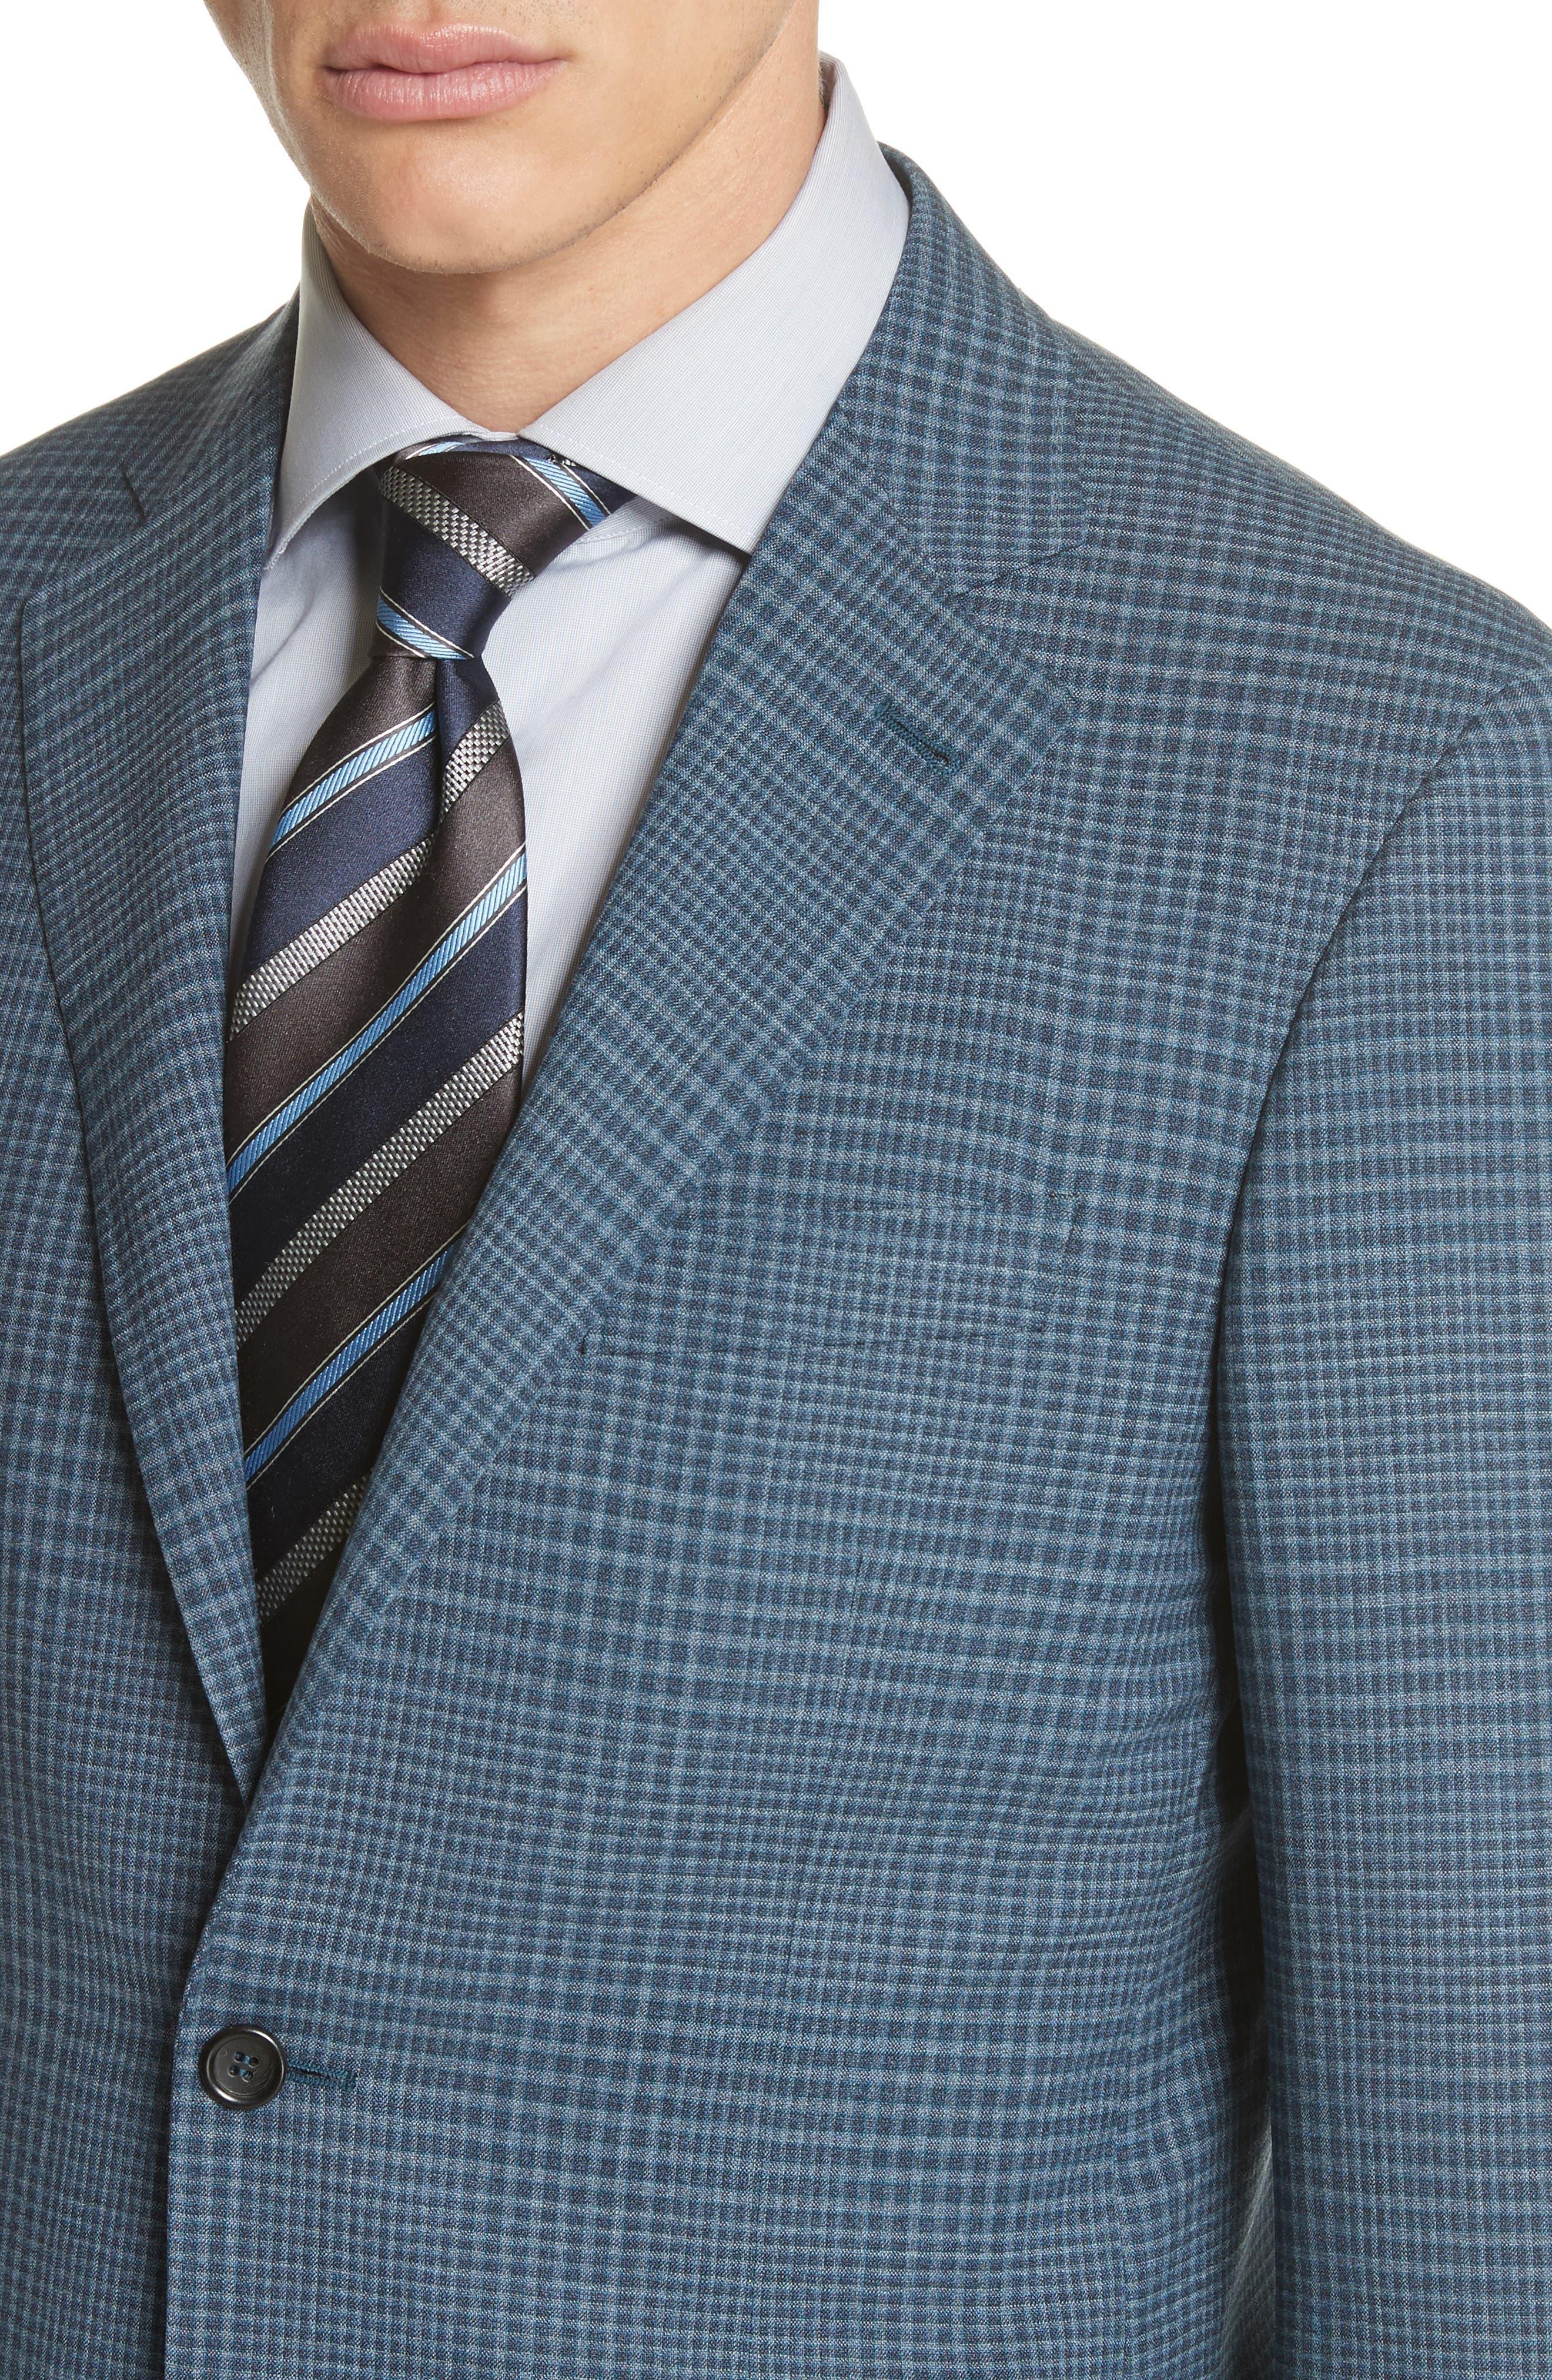 Kei Classic Fit Plaid Wool Sport Coat,                             Alternate thumbnail 4, color,                             Navy